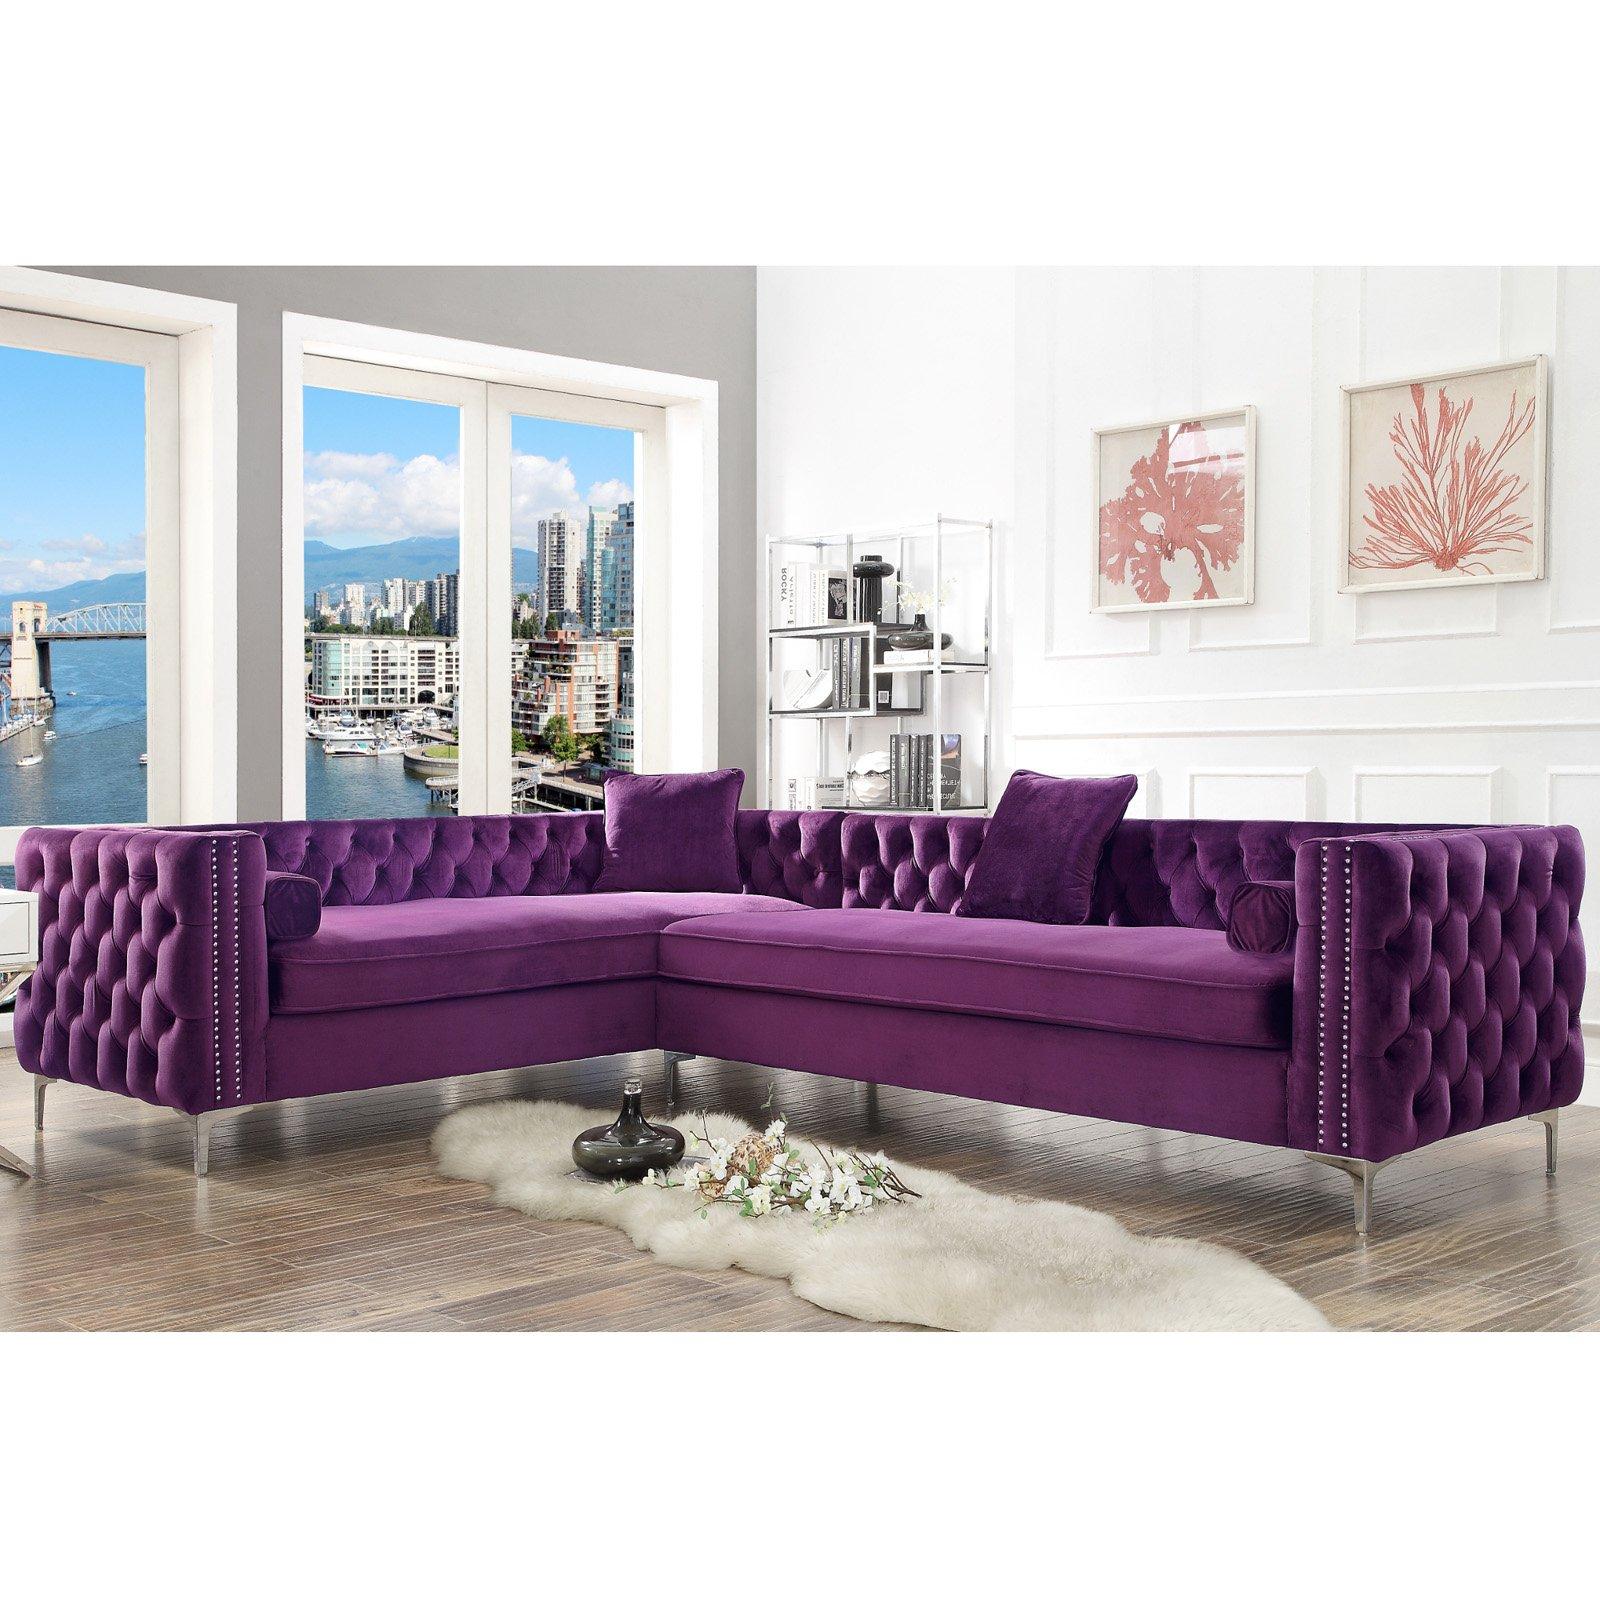 Remarkable Inspired Home Richard Corner Sectional Sofa Purple Ncnpc Chair Design For Home Ncnpcorg